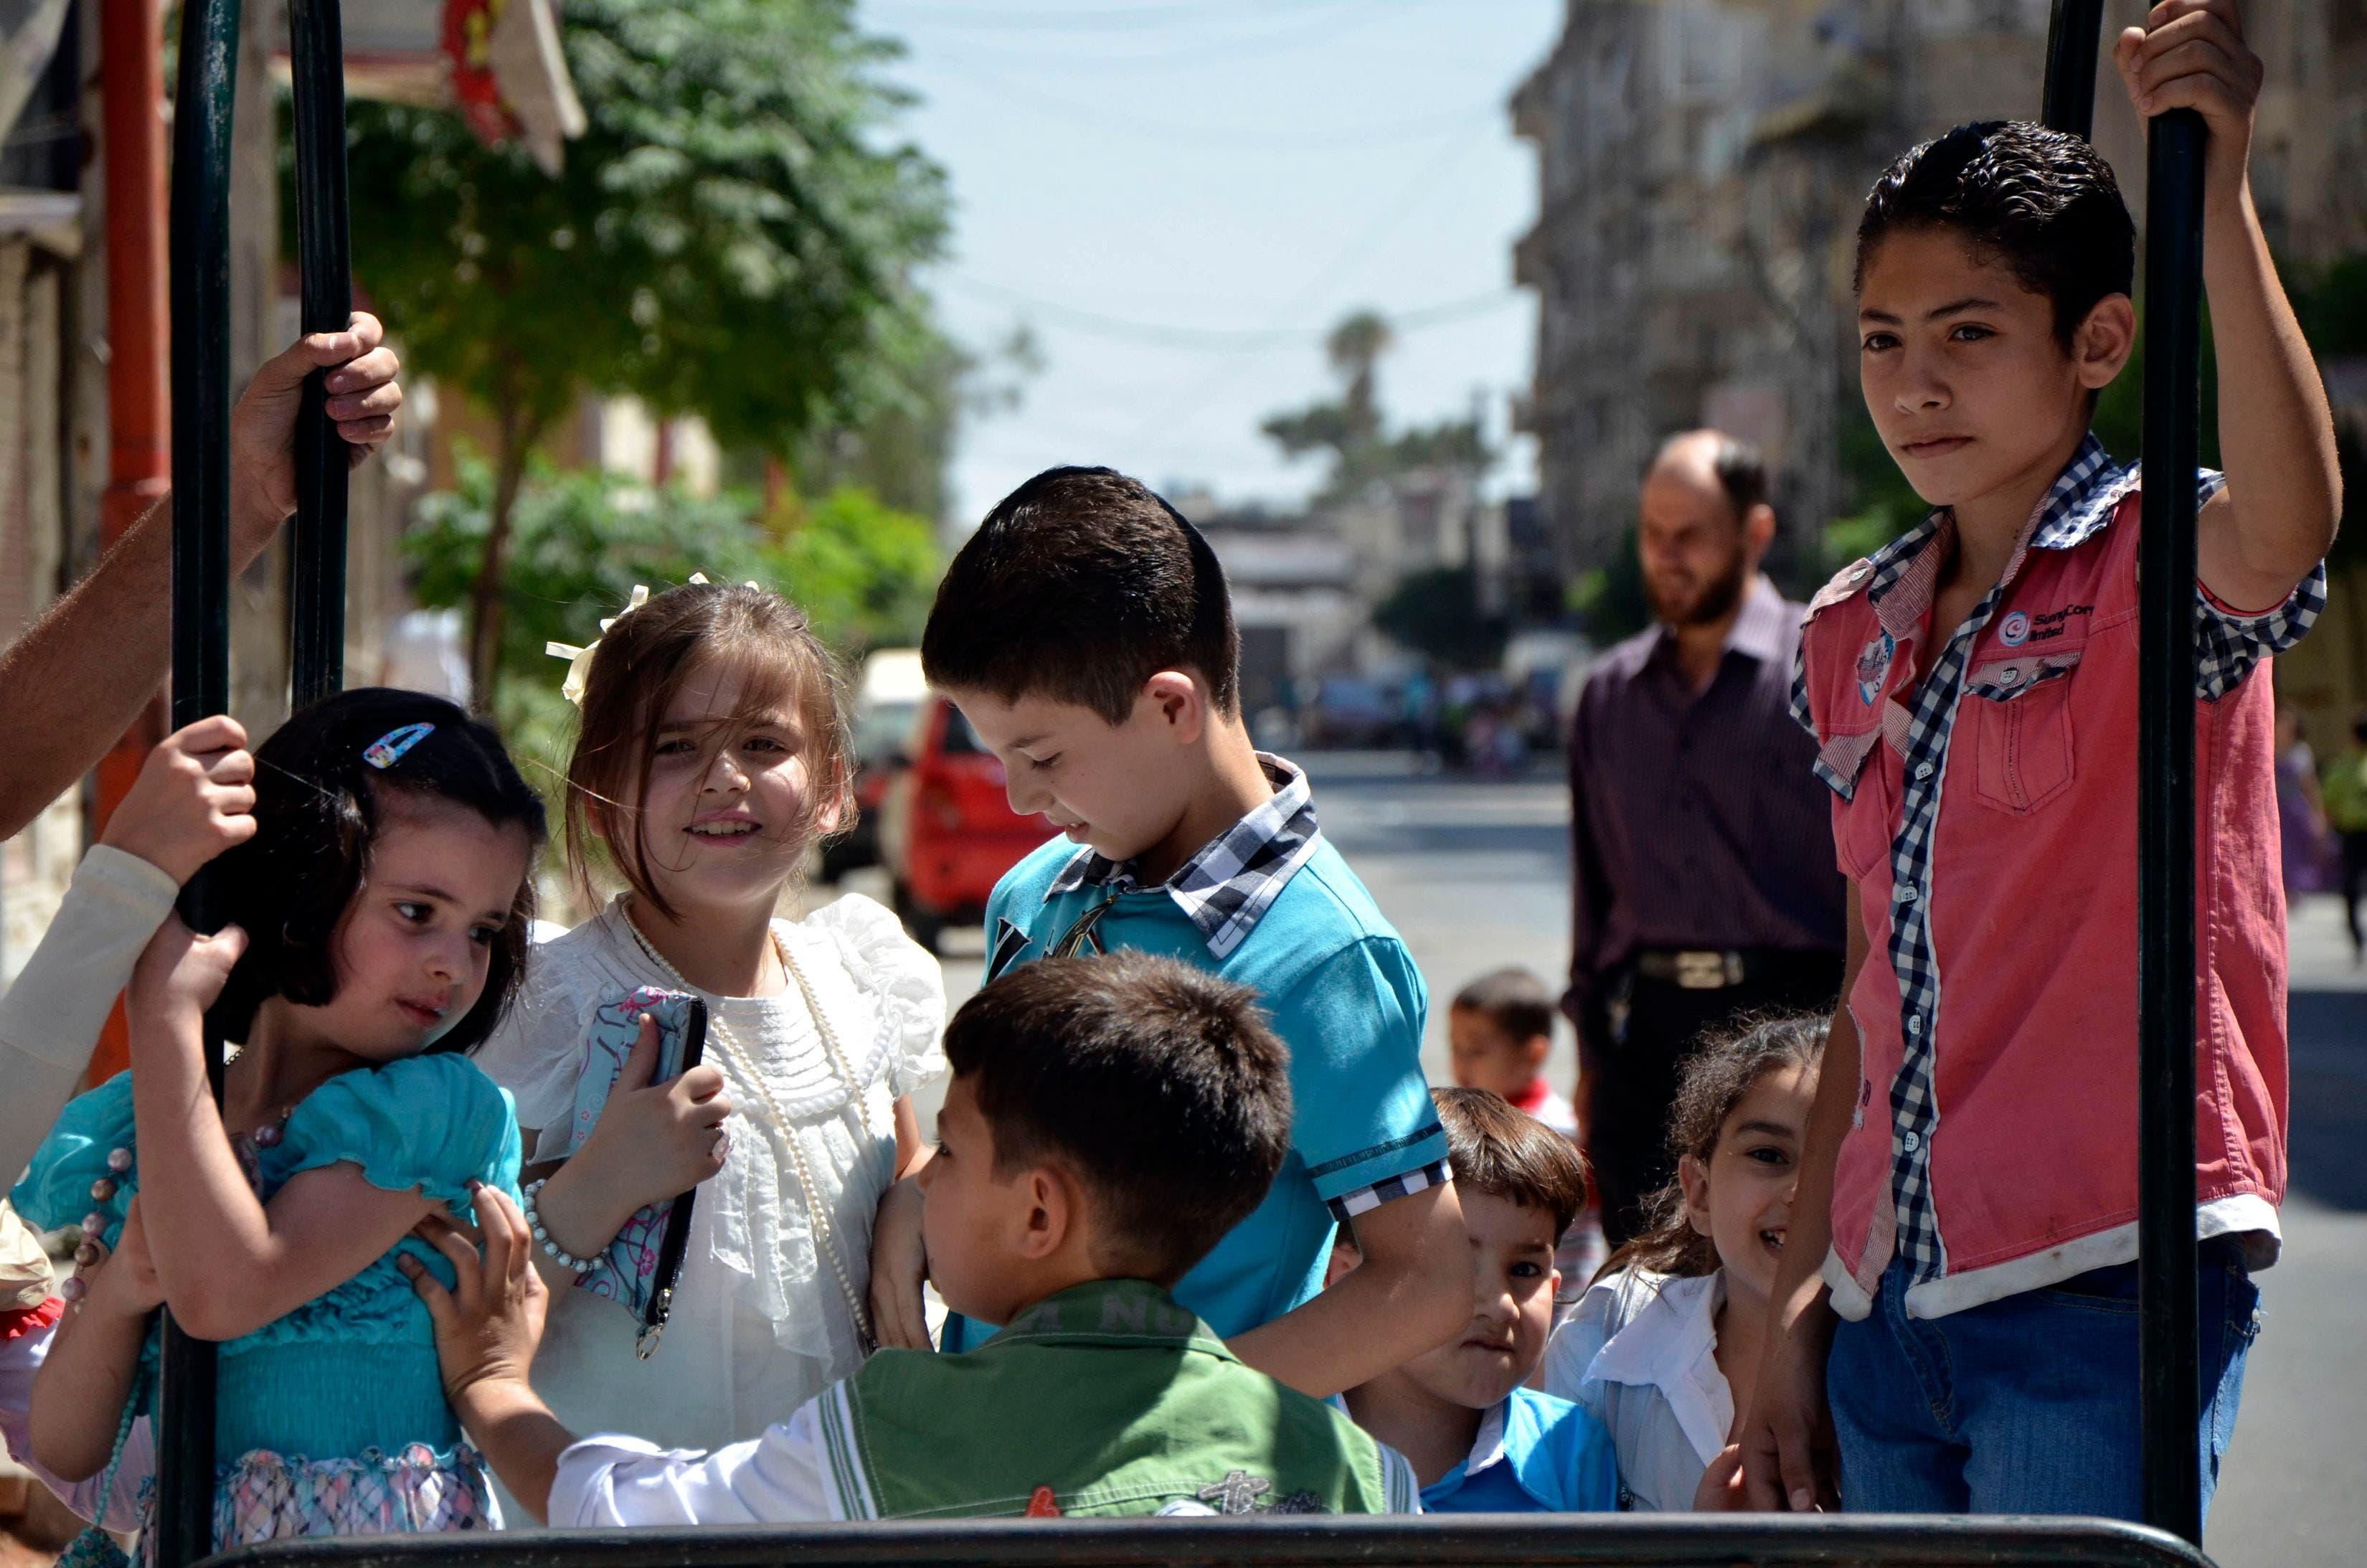 Muslim children celebrate Eid